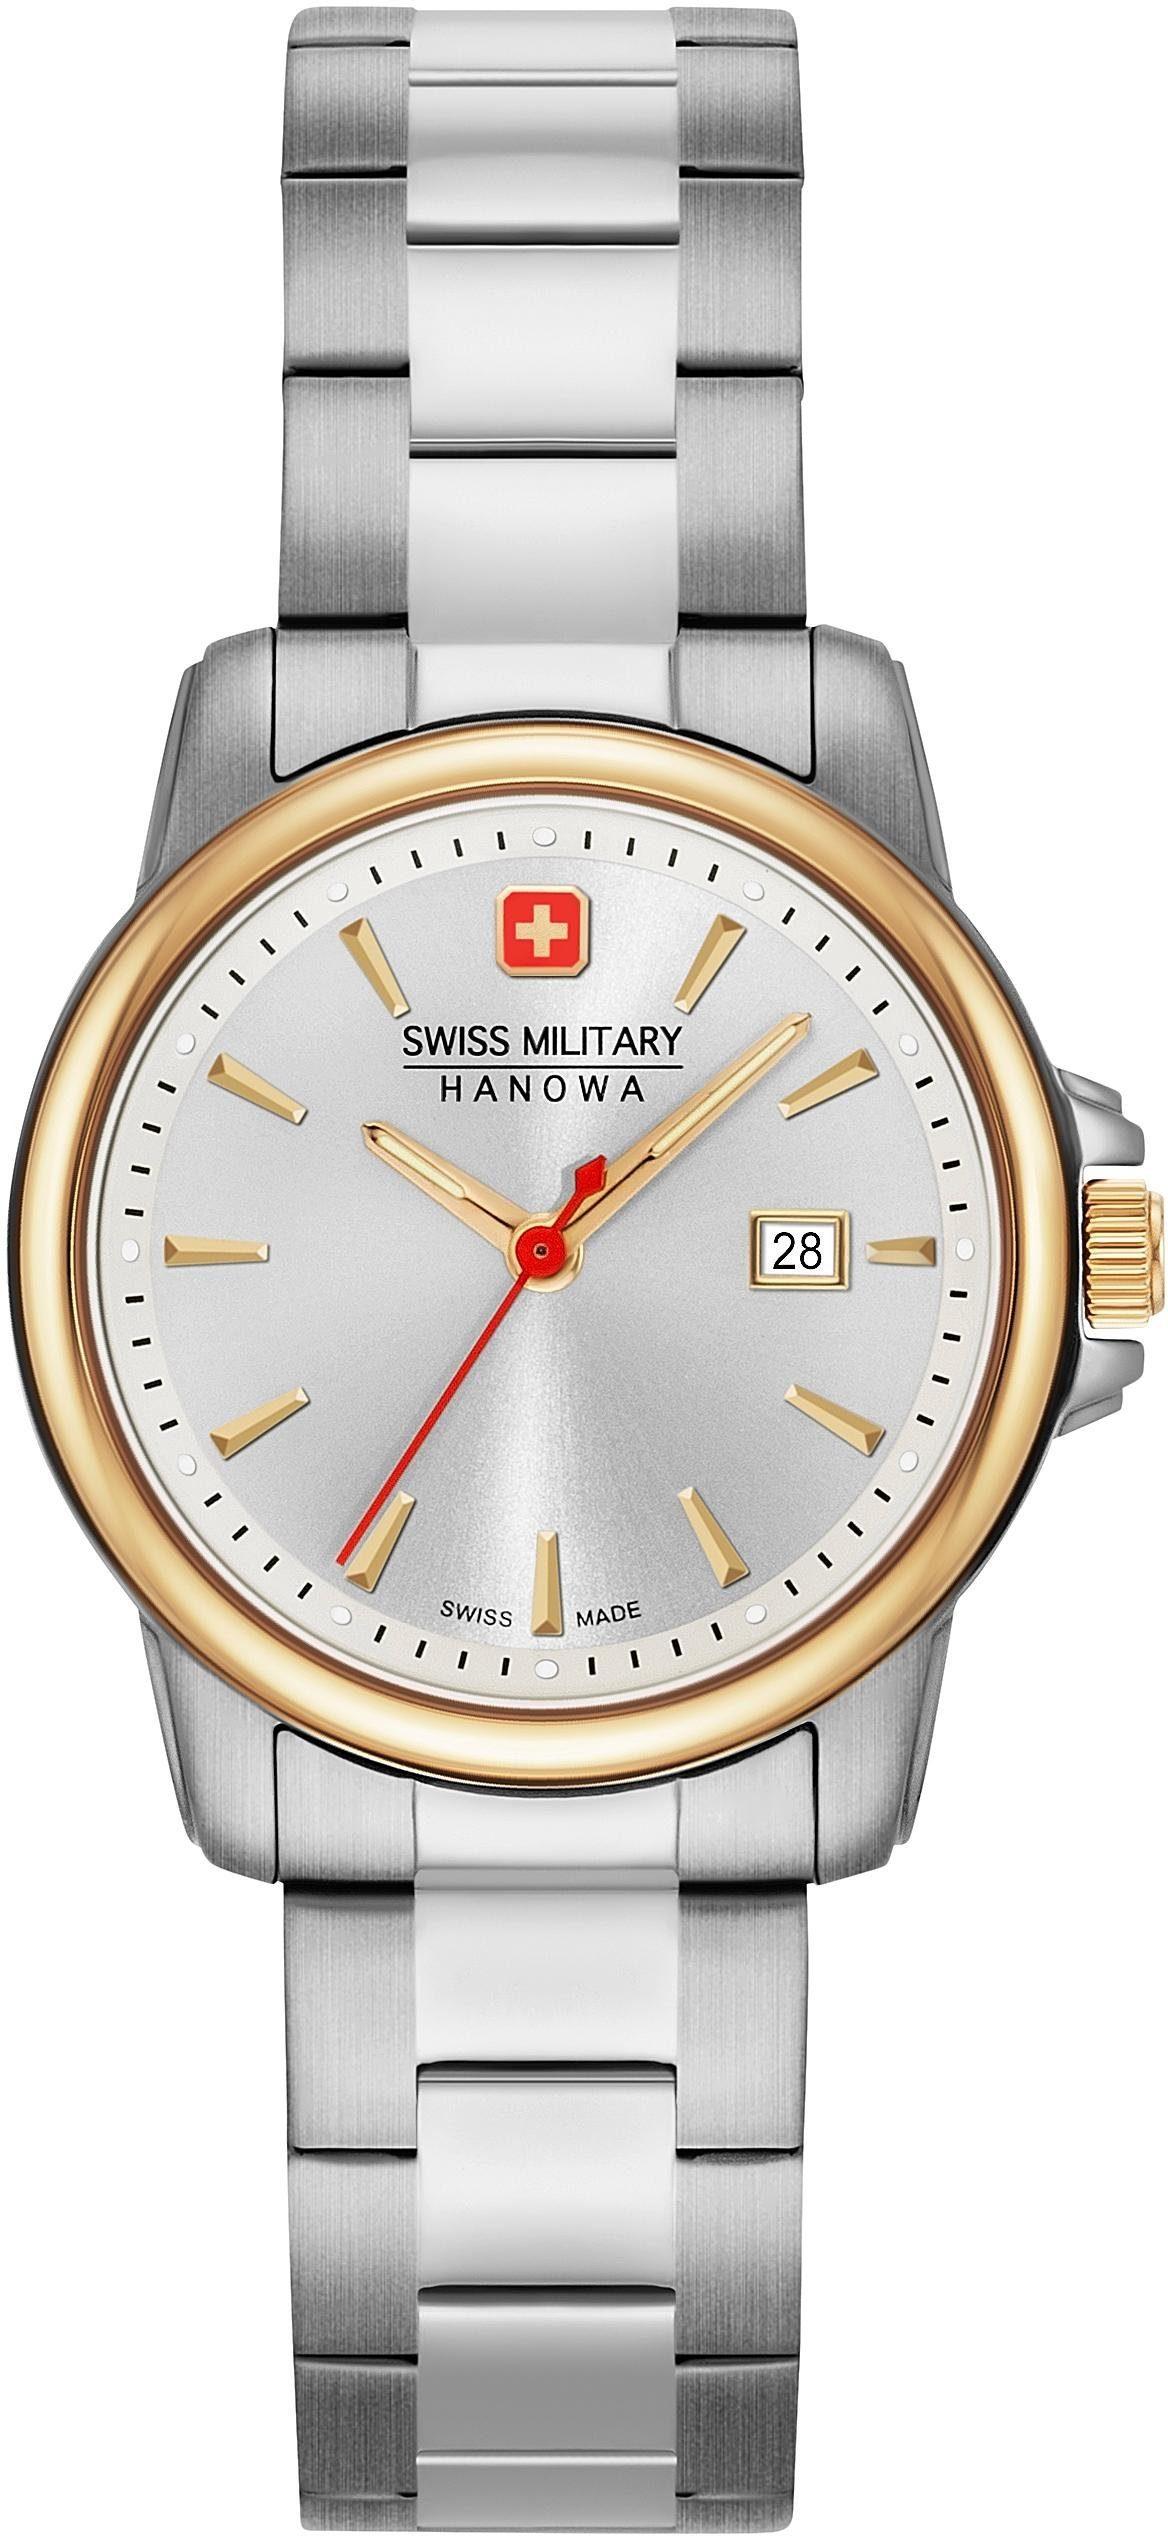 Swiss Military Hanowa Schweizer Uhr SWISS RECRUIT LADY II 06-7230755001 | Uhren > Schweizer Uhren | Swiss Military Hanowa